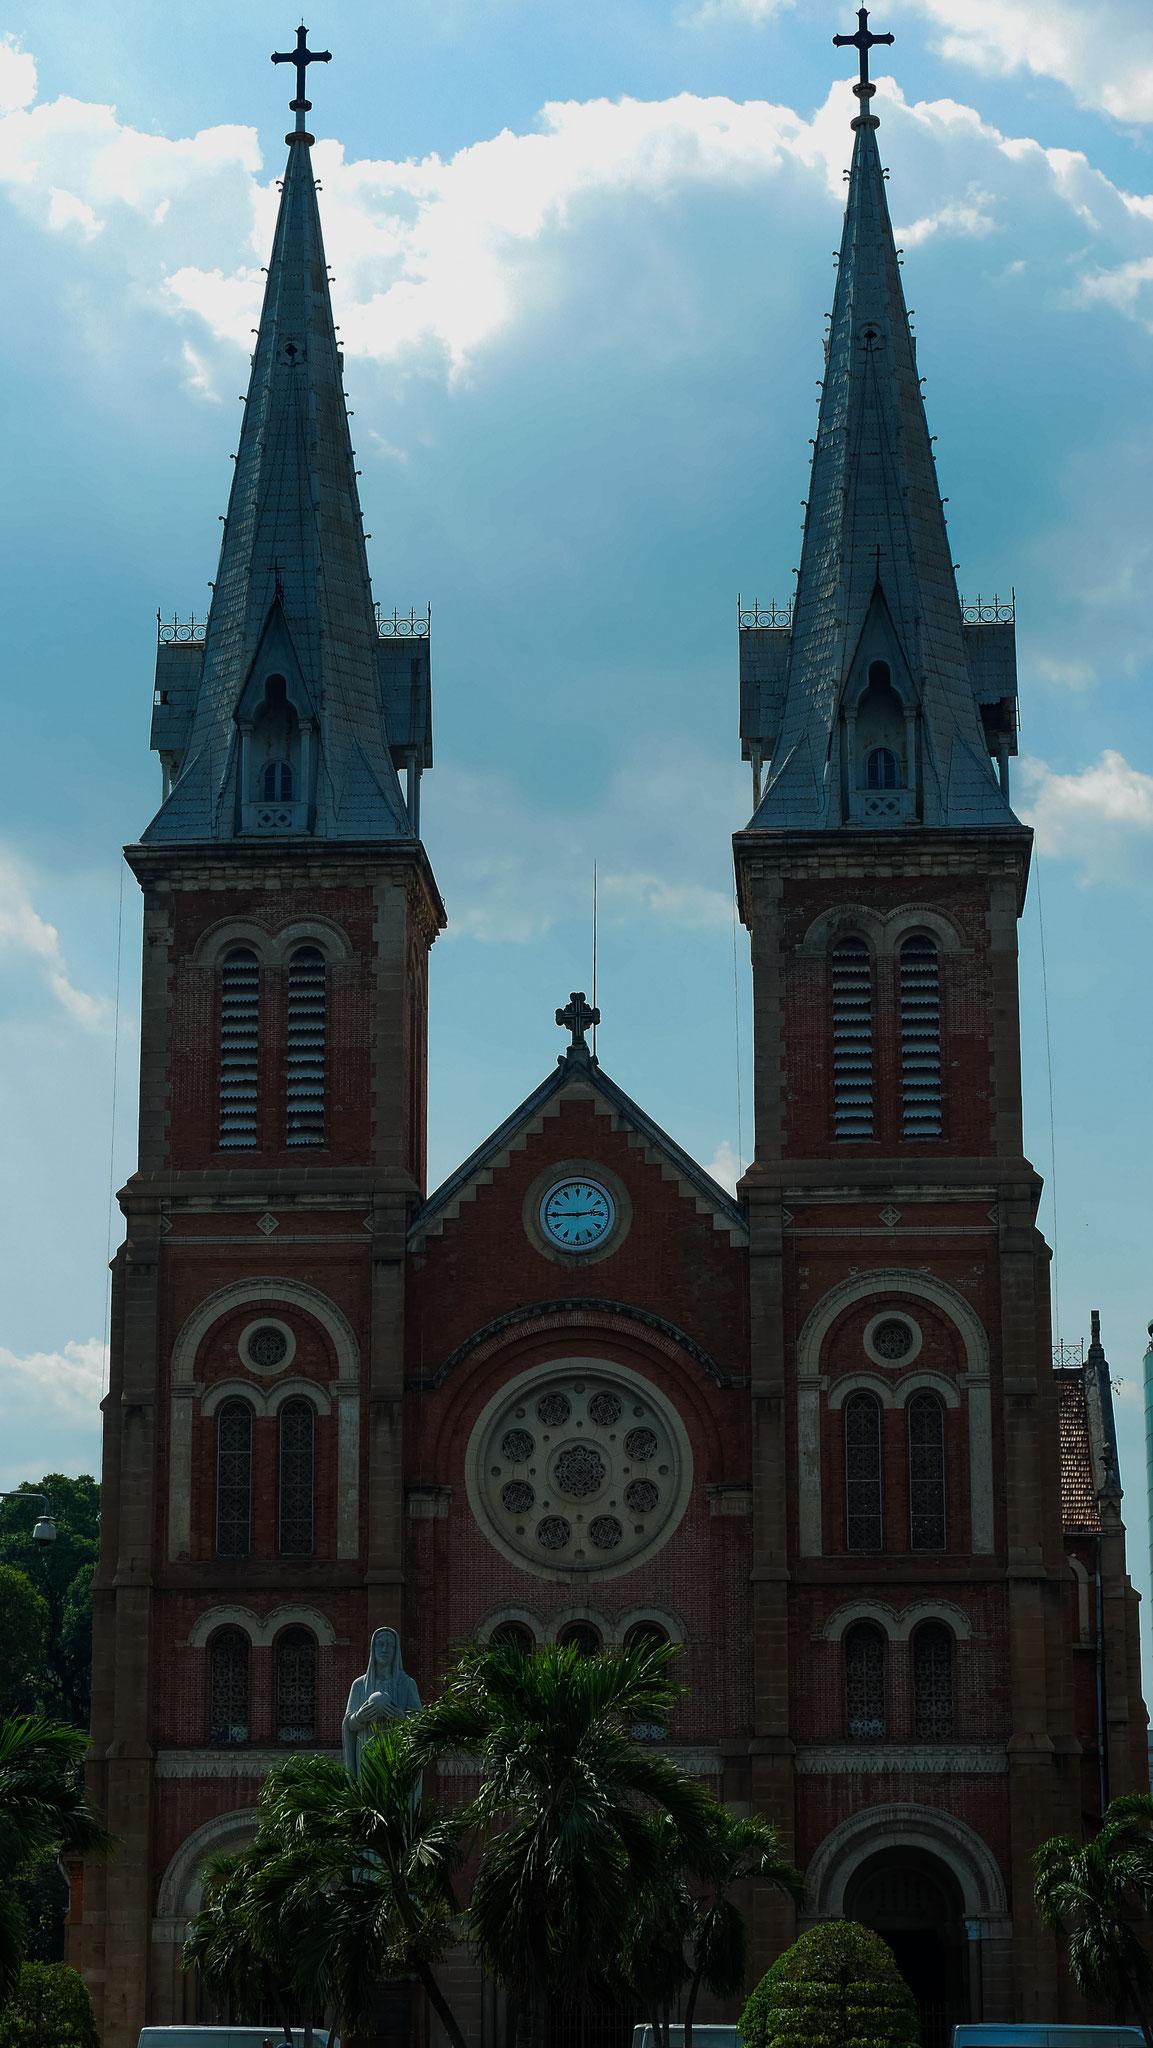 Ho-Chi-Minh-Stadt (Saigon) - Notre Dame Kathedrale